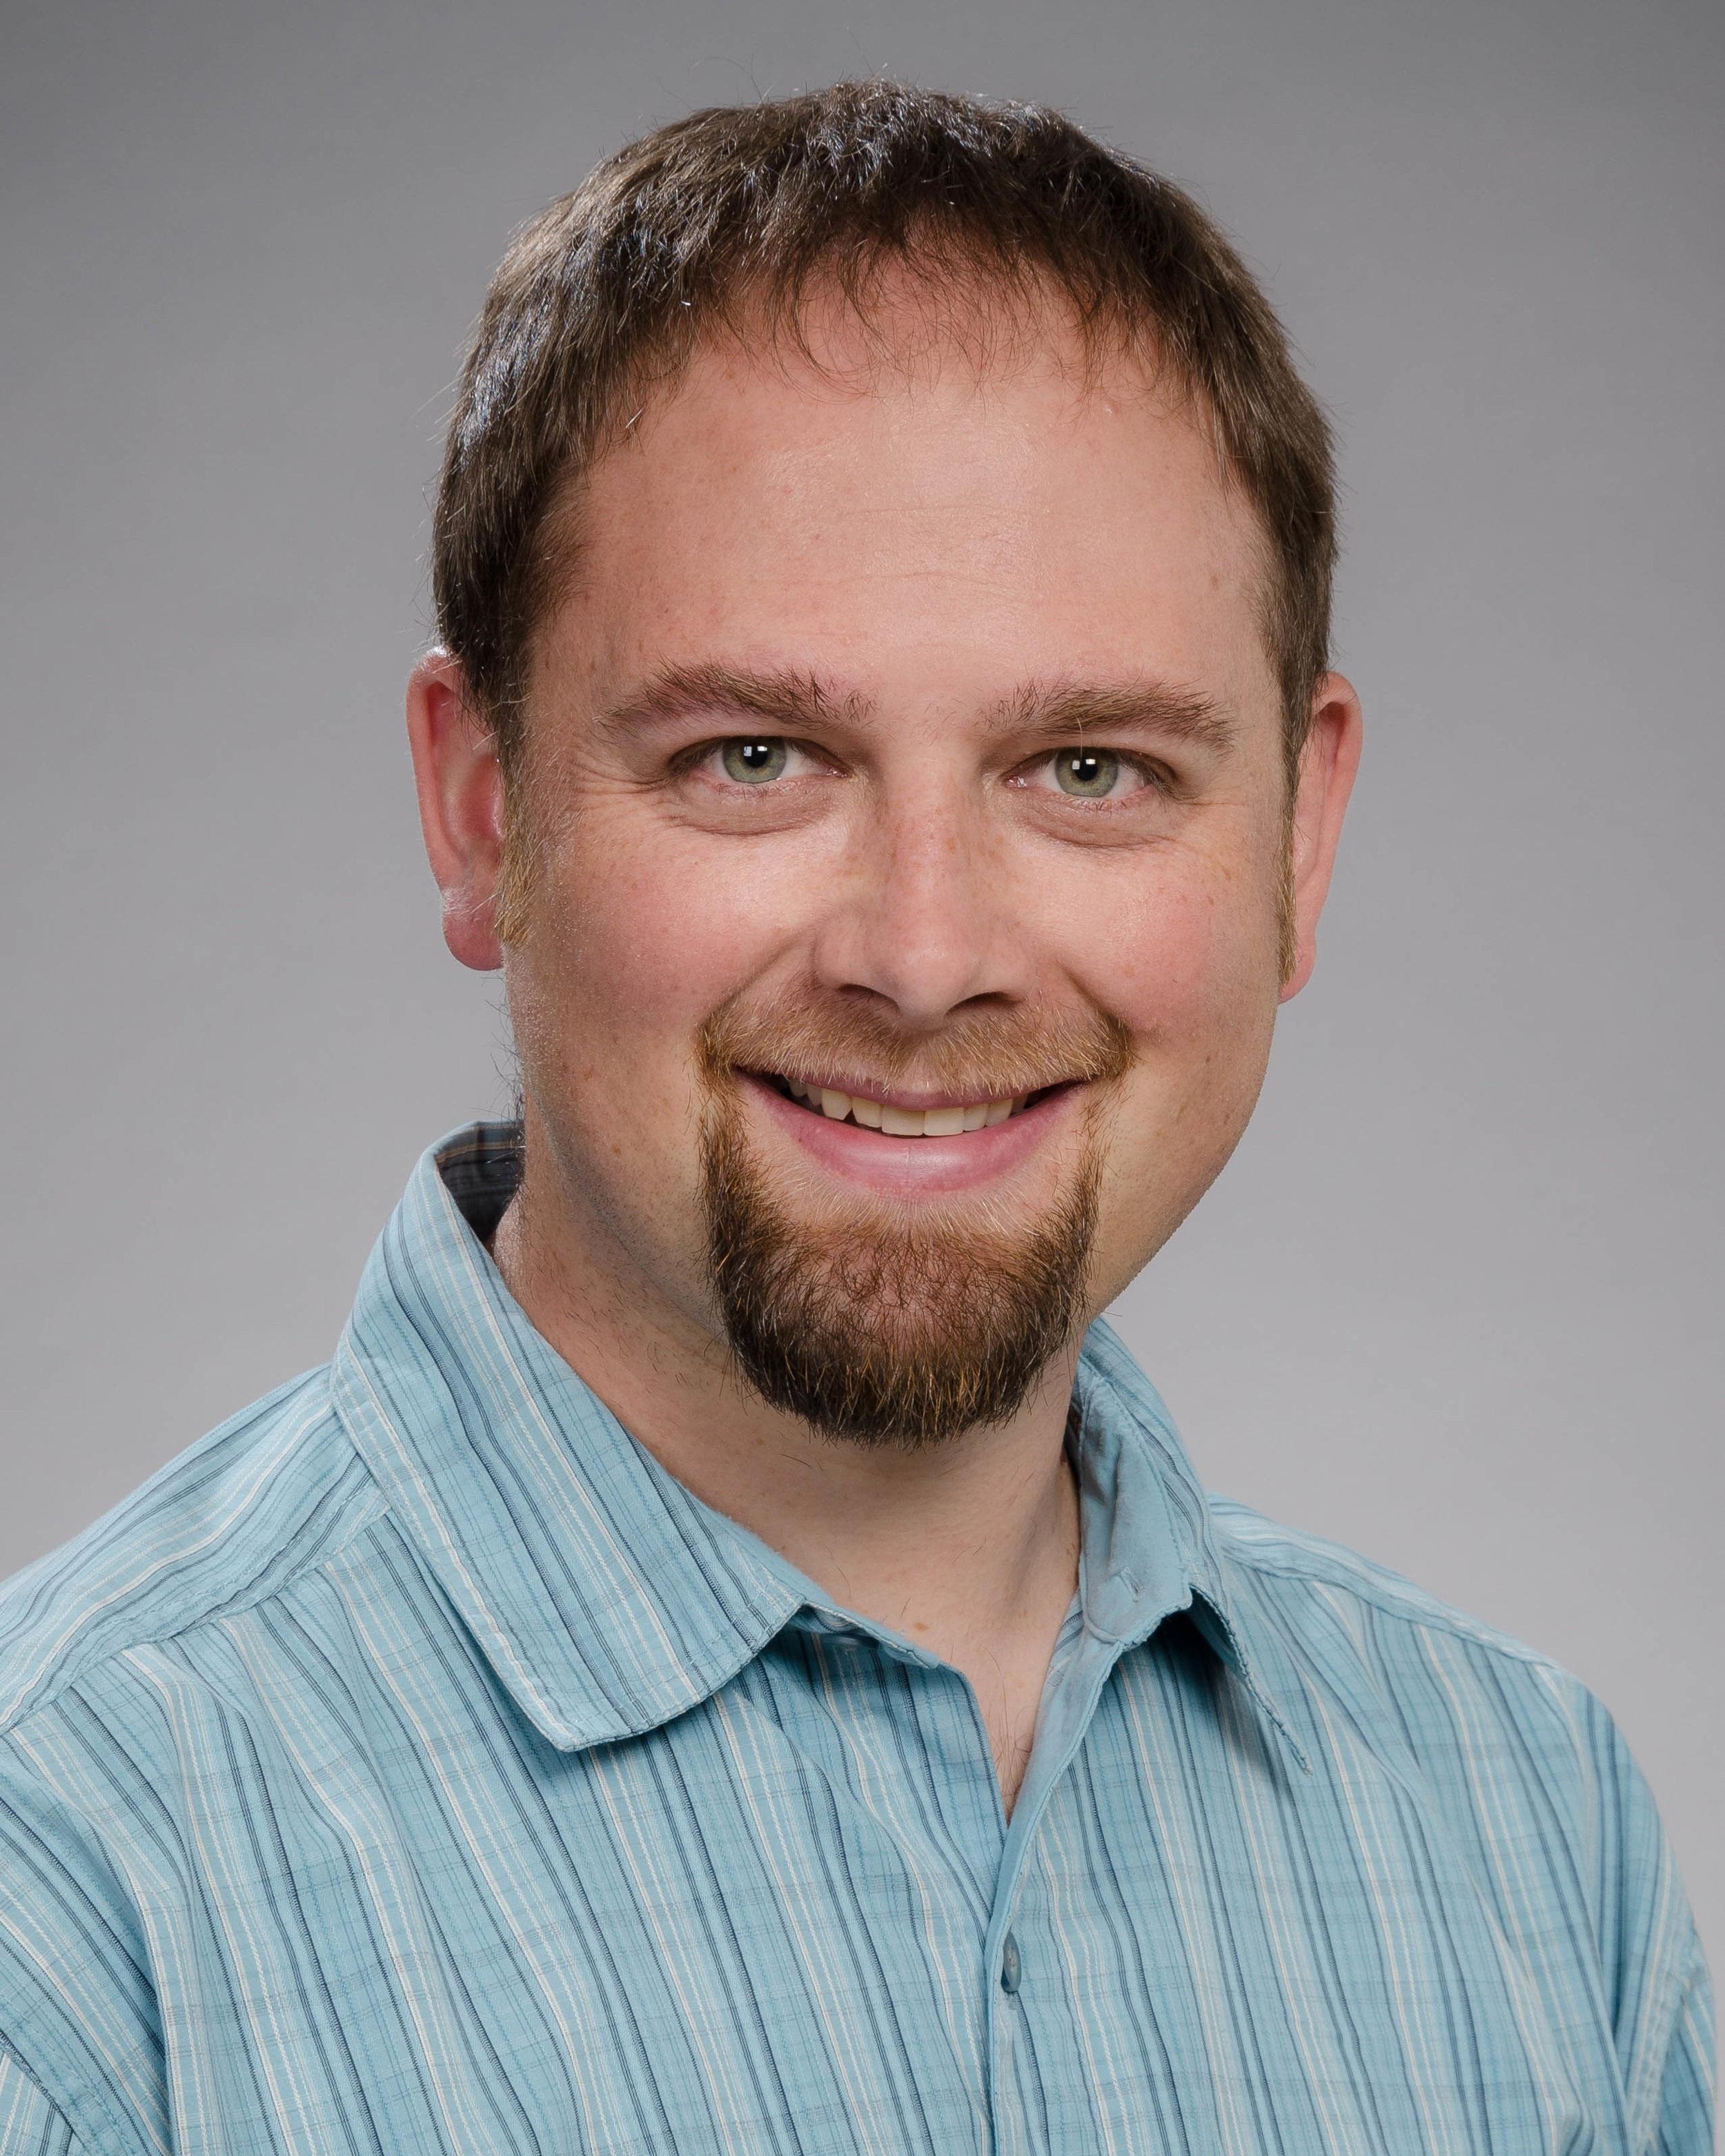 Dr Nathan Palpant - University of QueenslandStem cell engineering